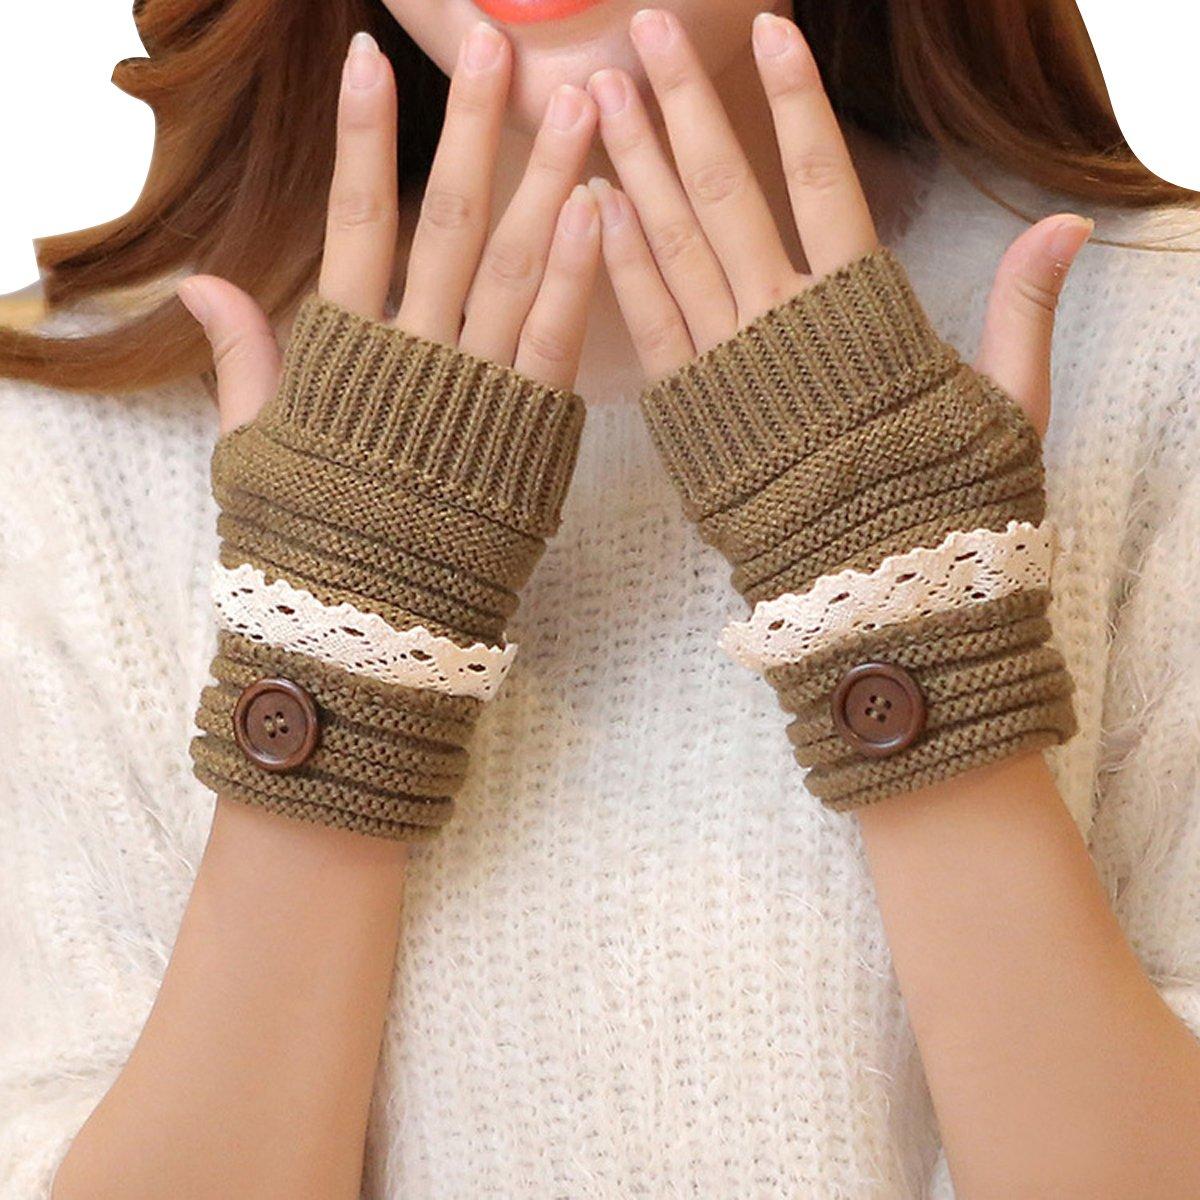 Stofirst Damen Frauen Mode Herbst Winter Fingerlos Thumbhole Häkeln Gestrickt Lace Button Handschuhe Fäustlinge Handwärmer